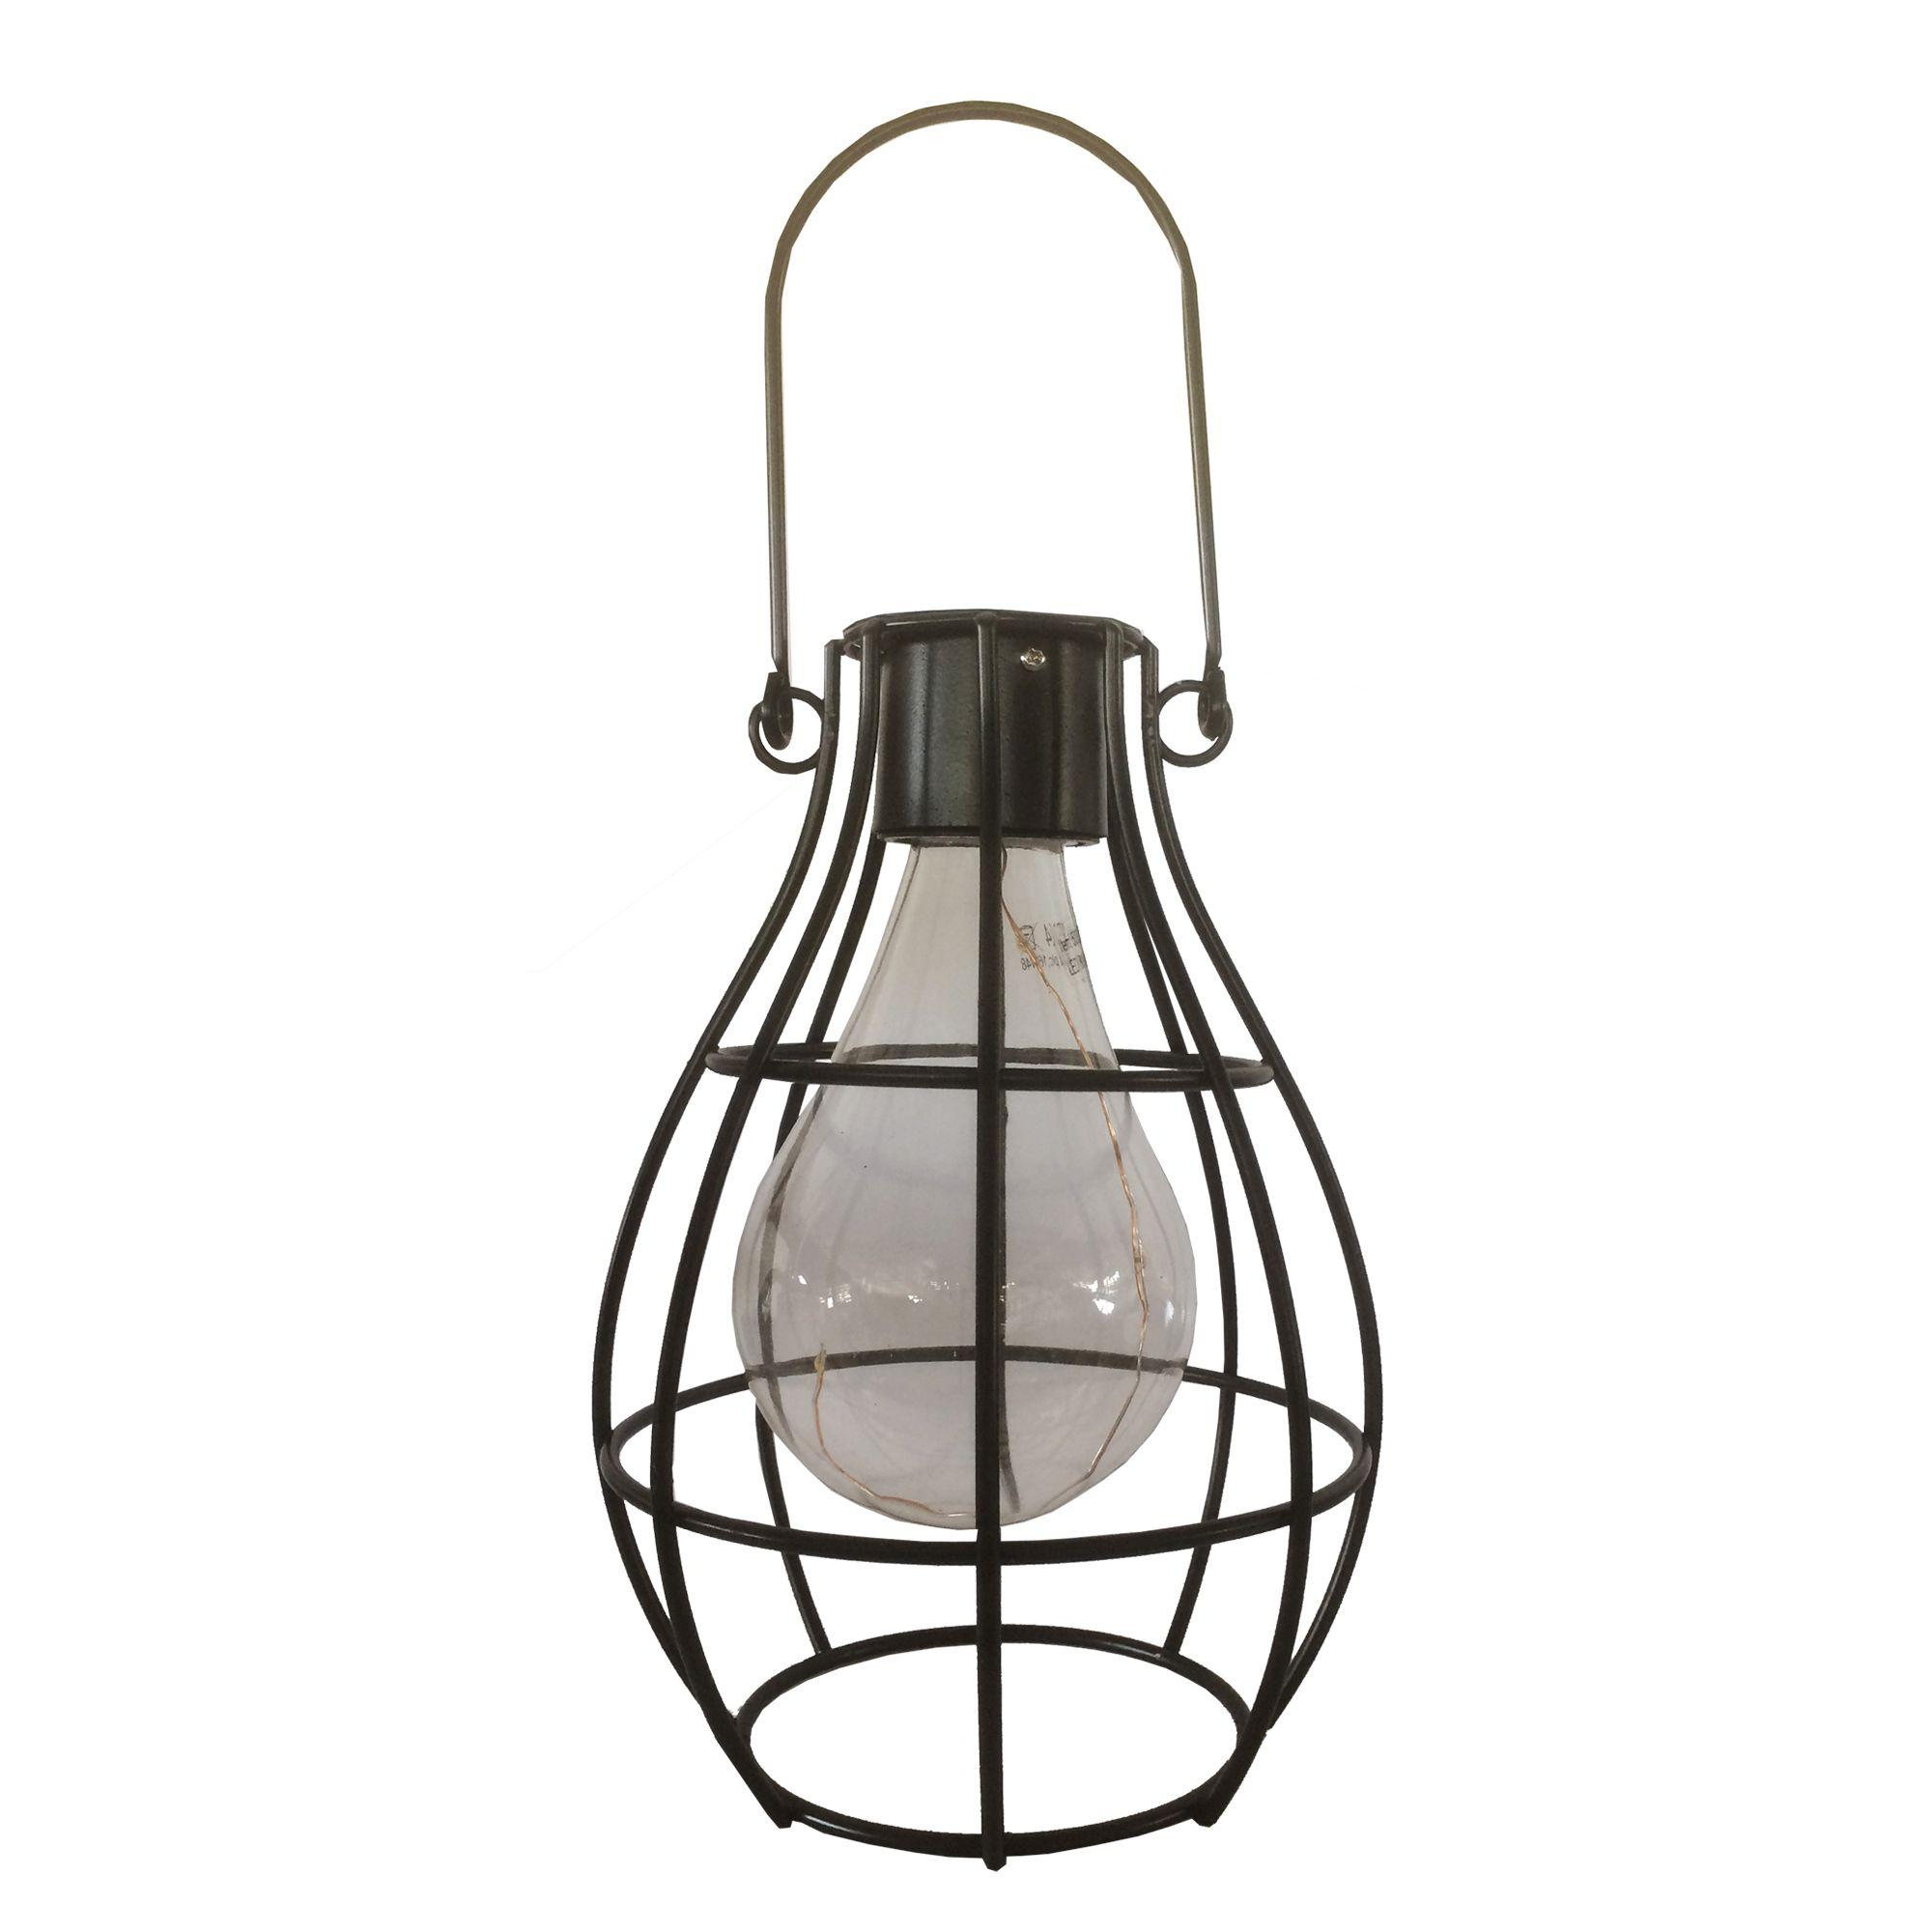 Solar Lights B Q: Blooma Ellopos Black Matt Caged Solar Powered LED Hanging